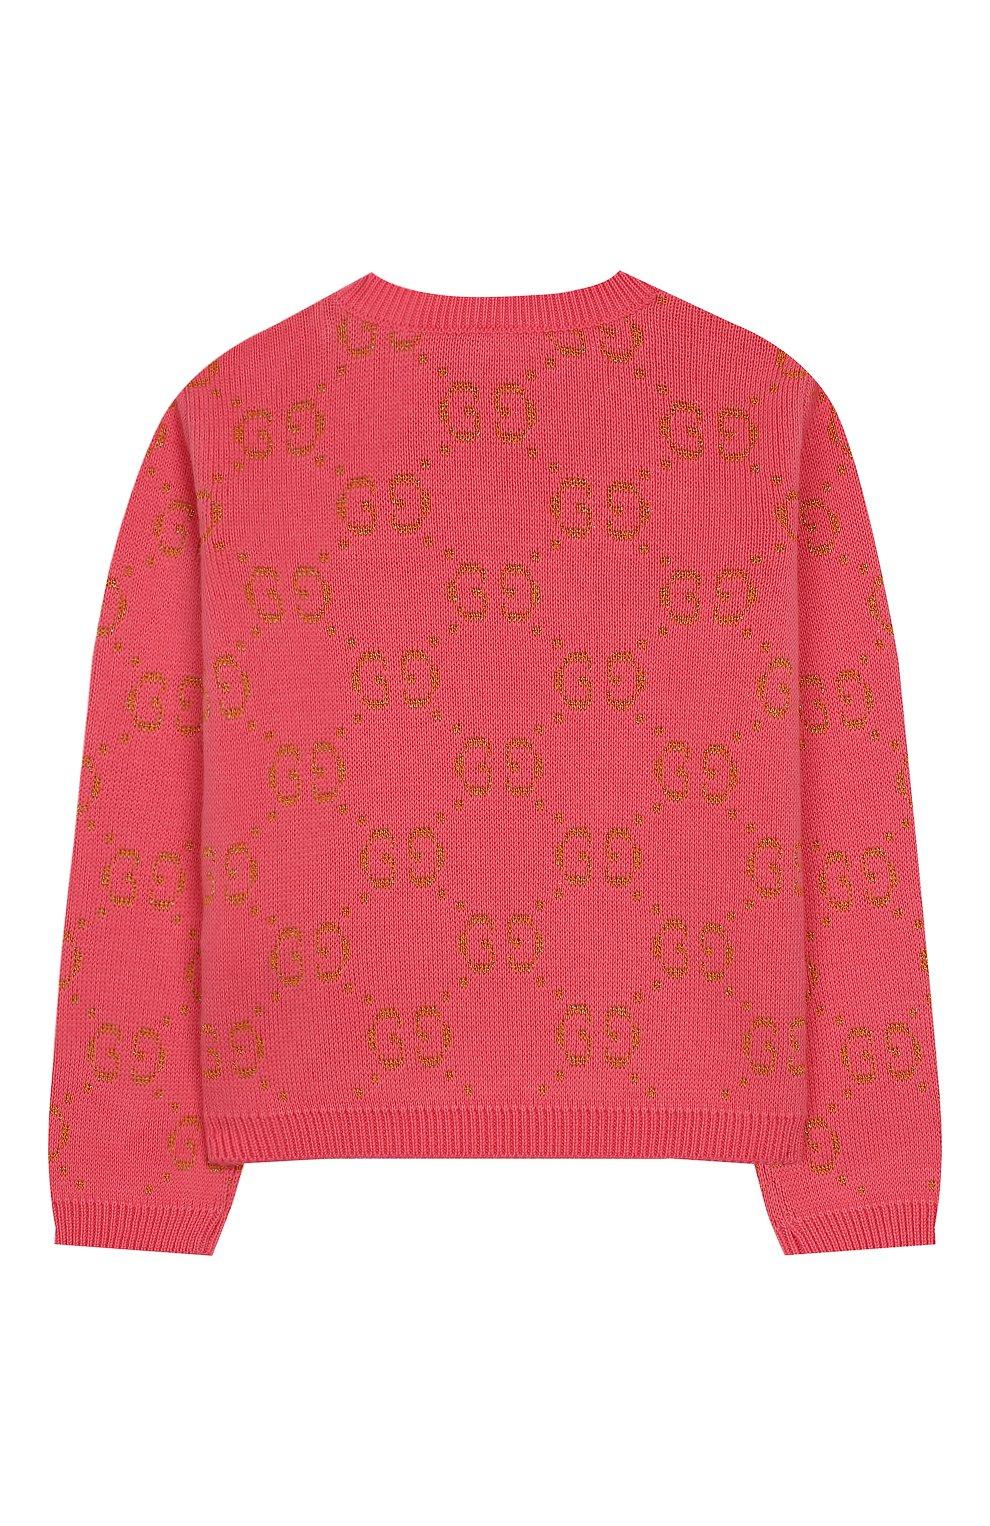 Детский хлопковый пуловер GUCCI розового цвета, арт. 580627/XKAHM   Фото 2